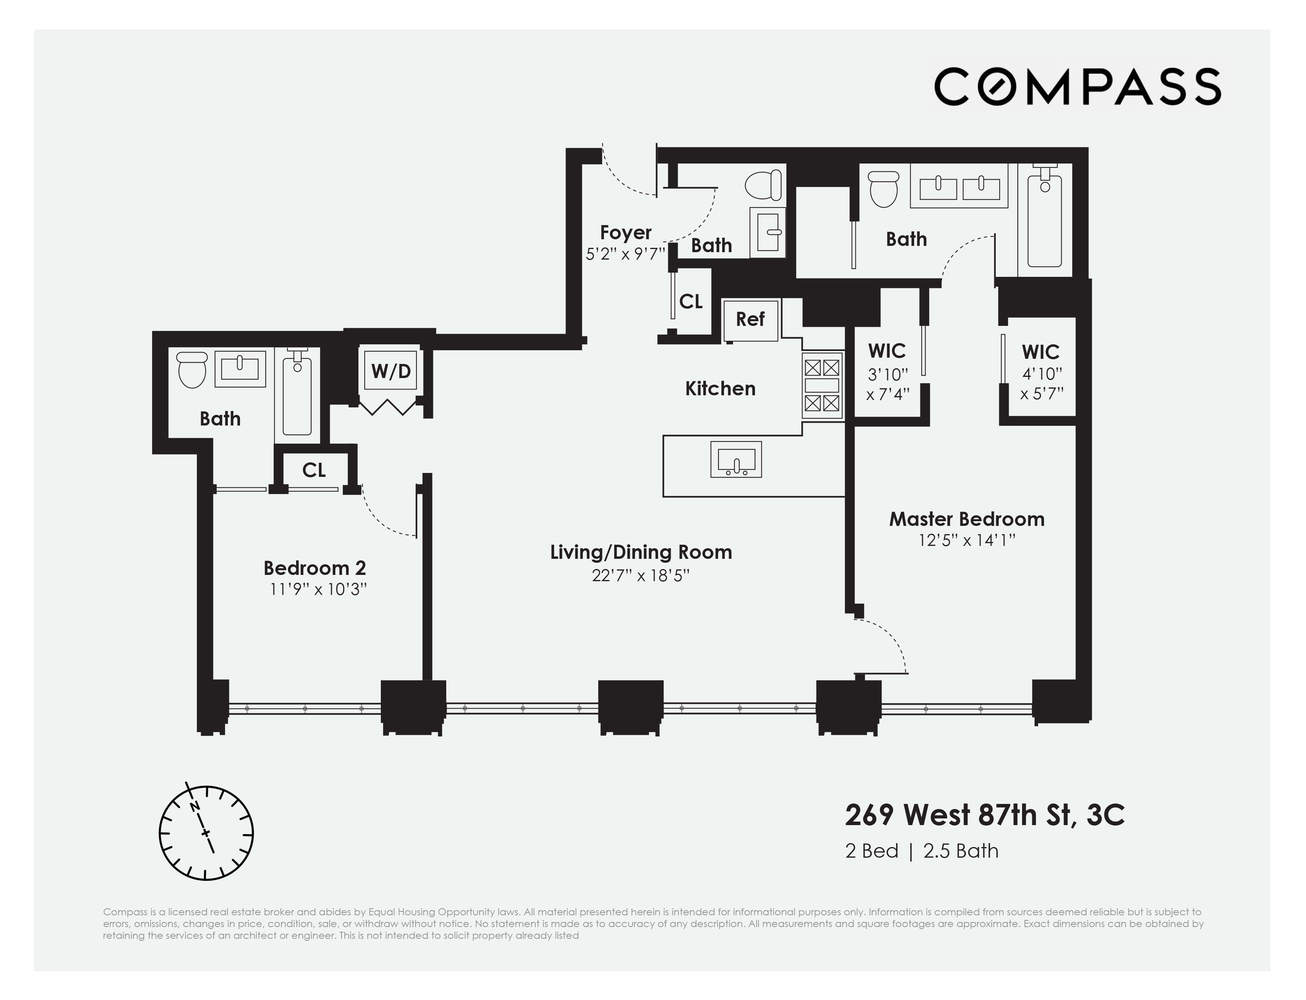 269 West 87th Street 3-C